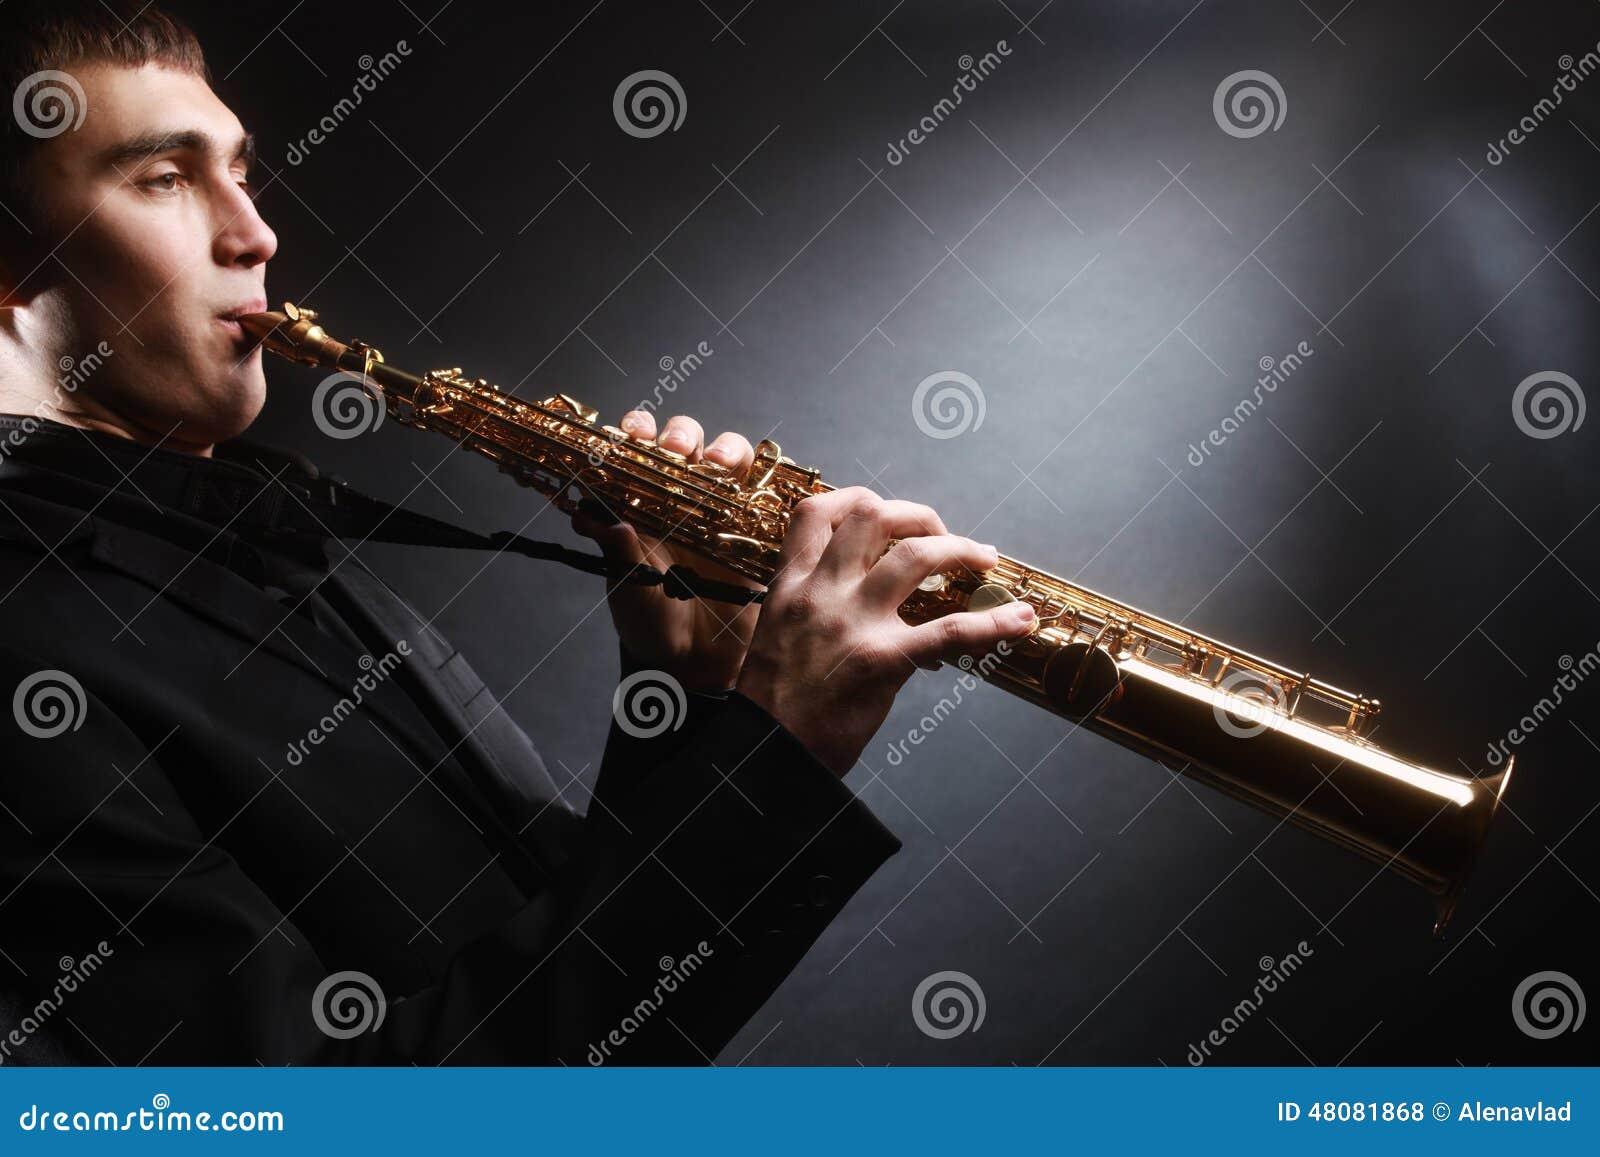 Soprano saxophone player